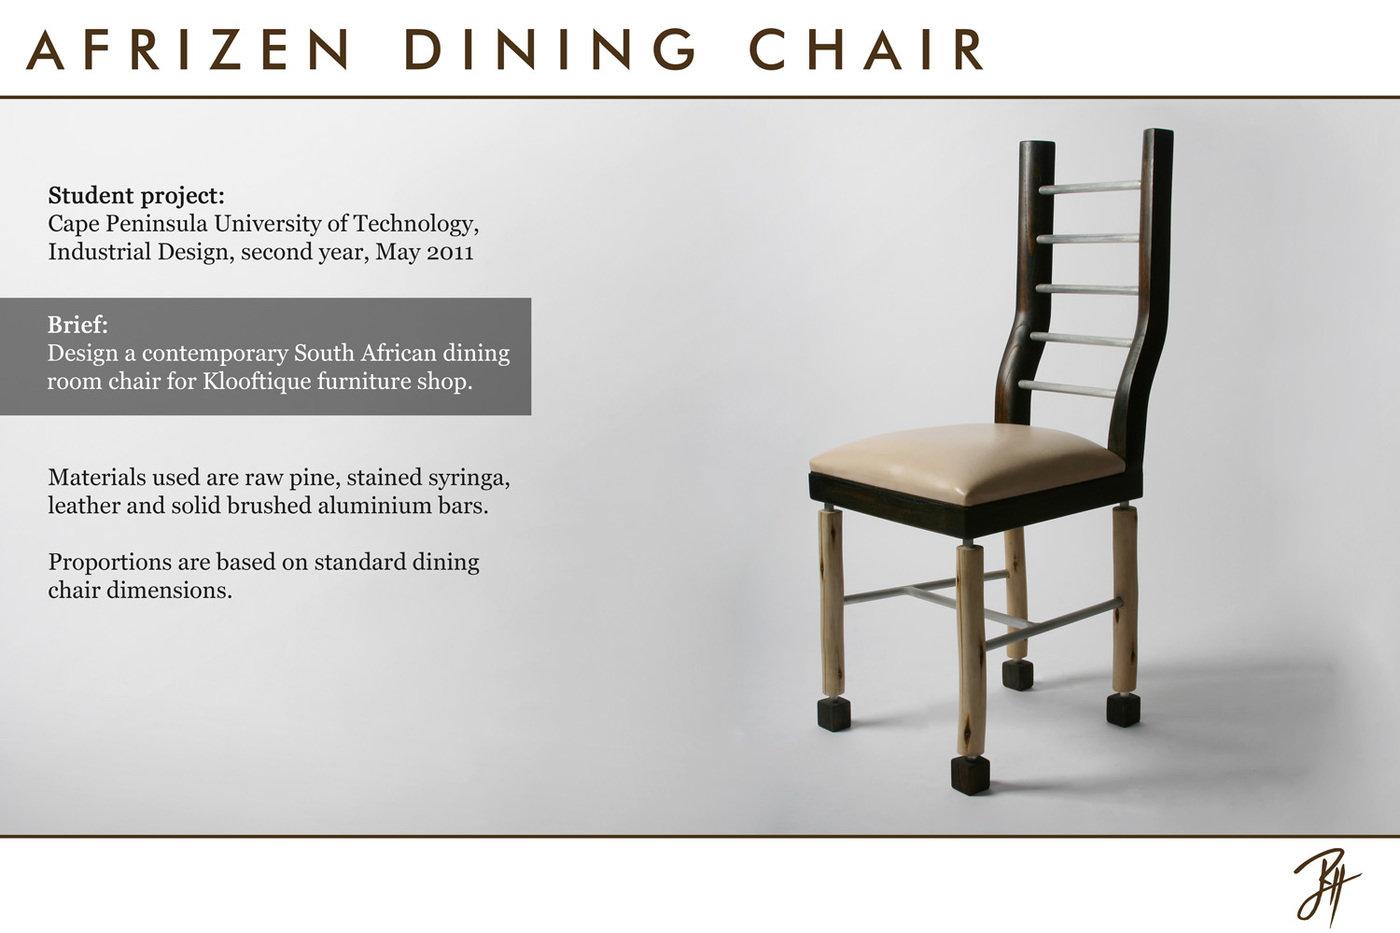 Wondrous Afrizen Dining Chair By Ryan H At Coroflot Com Creativecarmelina Interior Chair Design Creativecarmelinacom